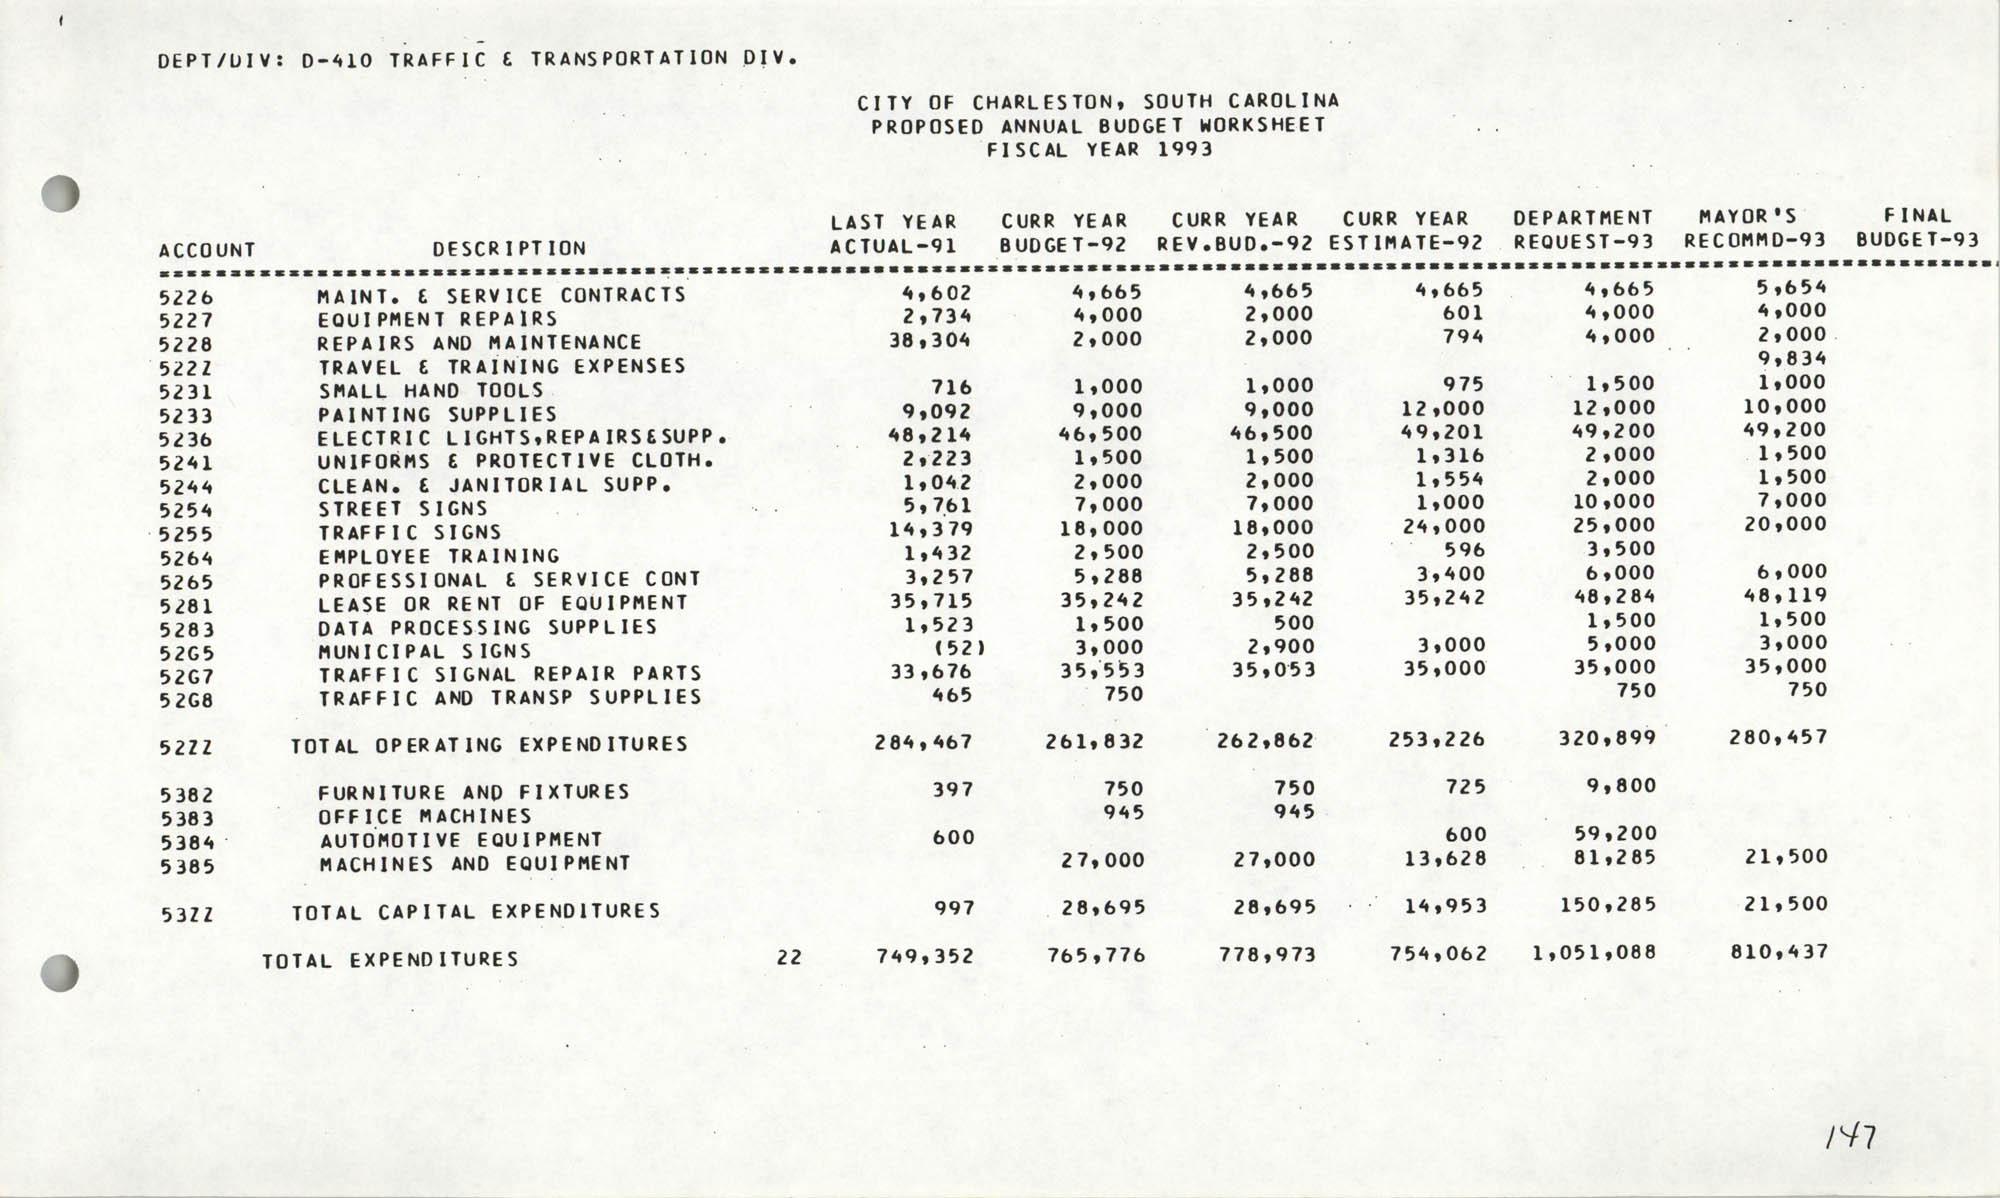 The City Council of Charleston, South Carolina, 1993 Budget, Page 147